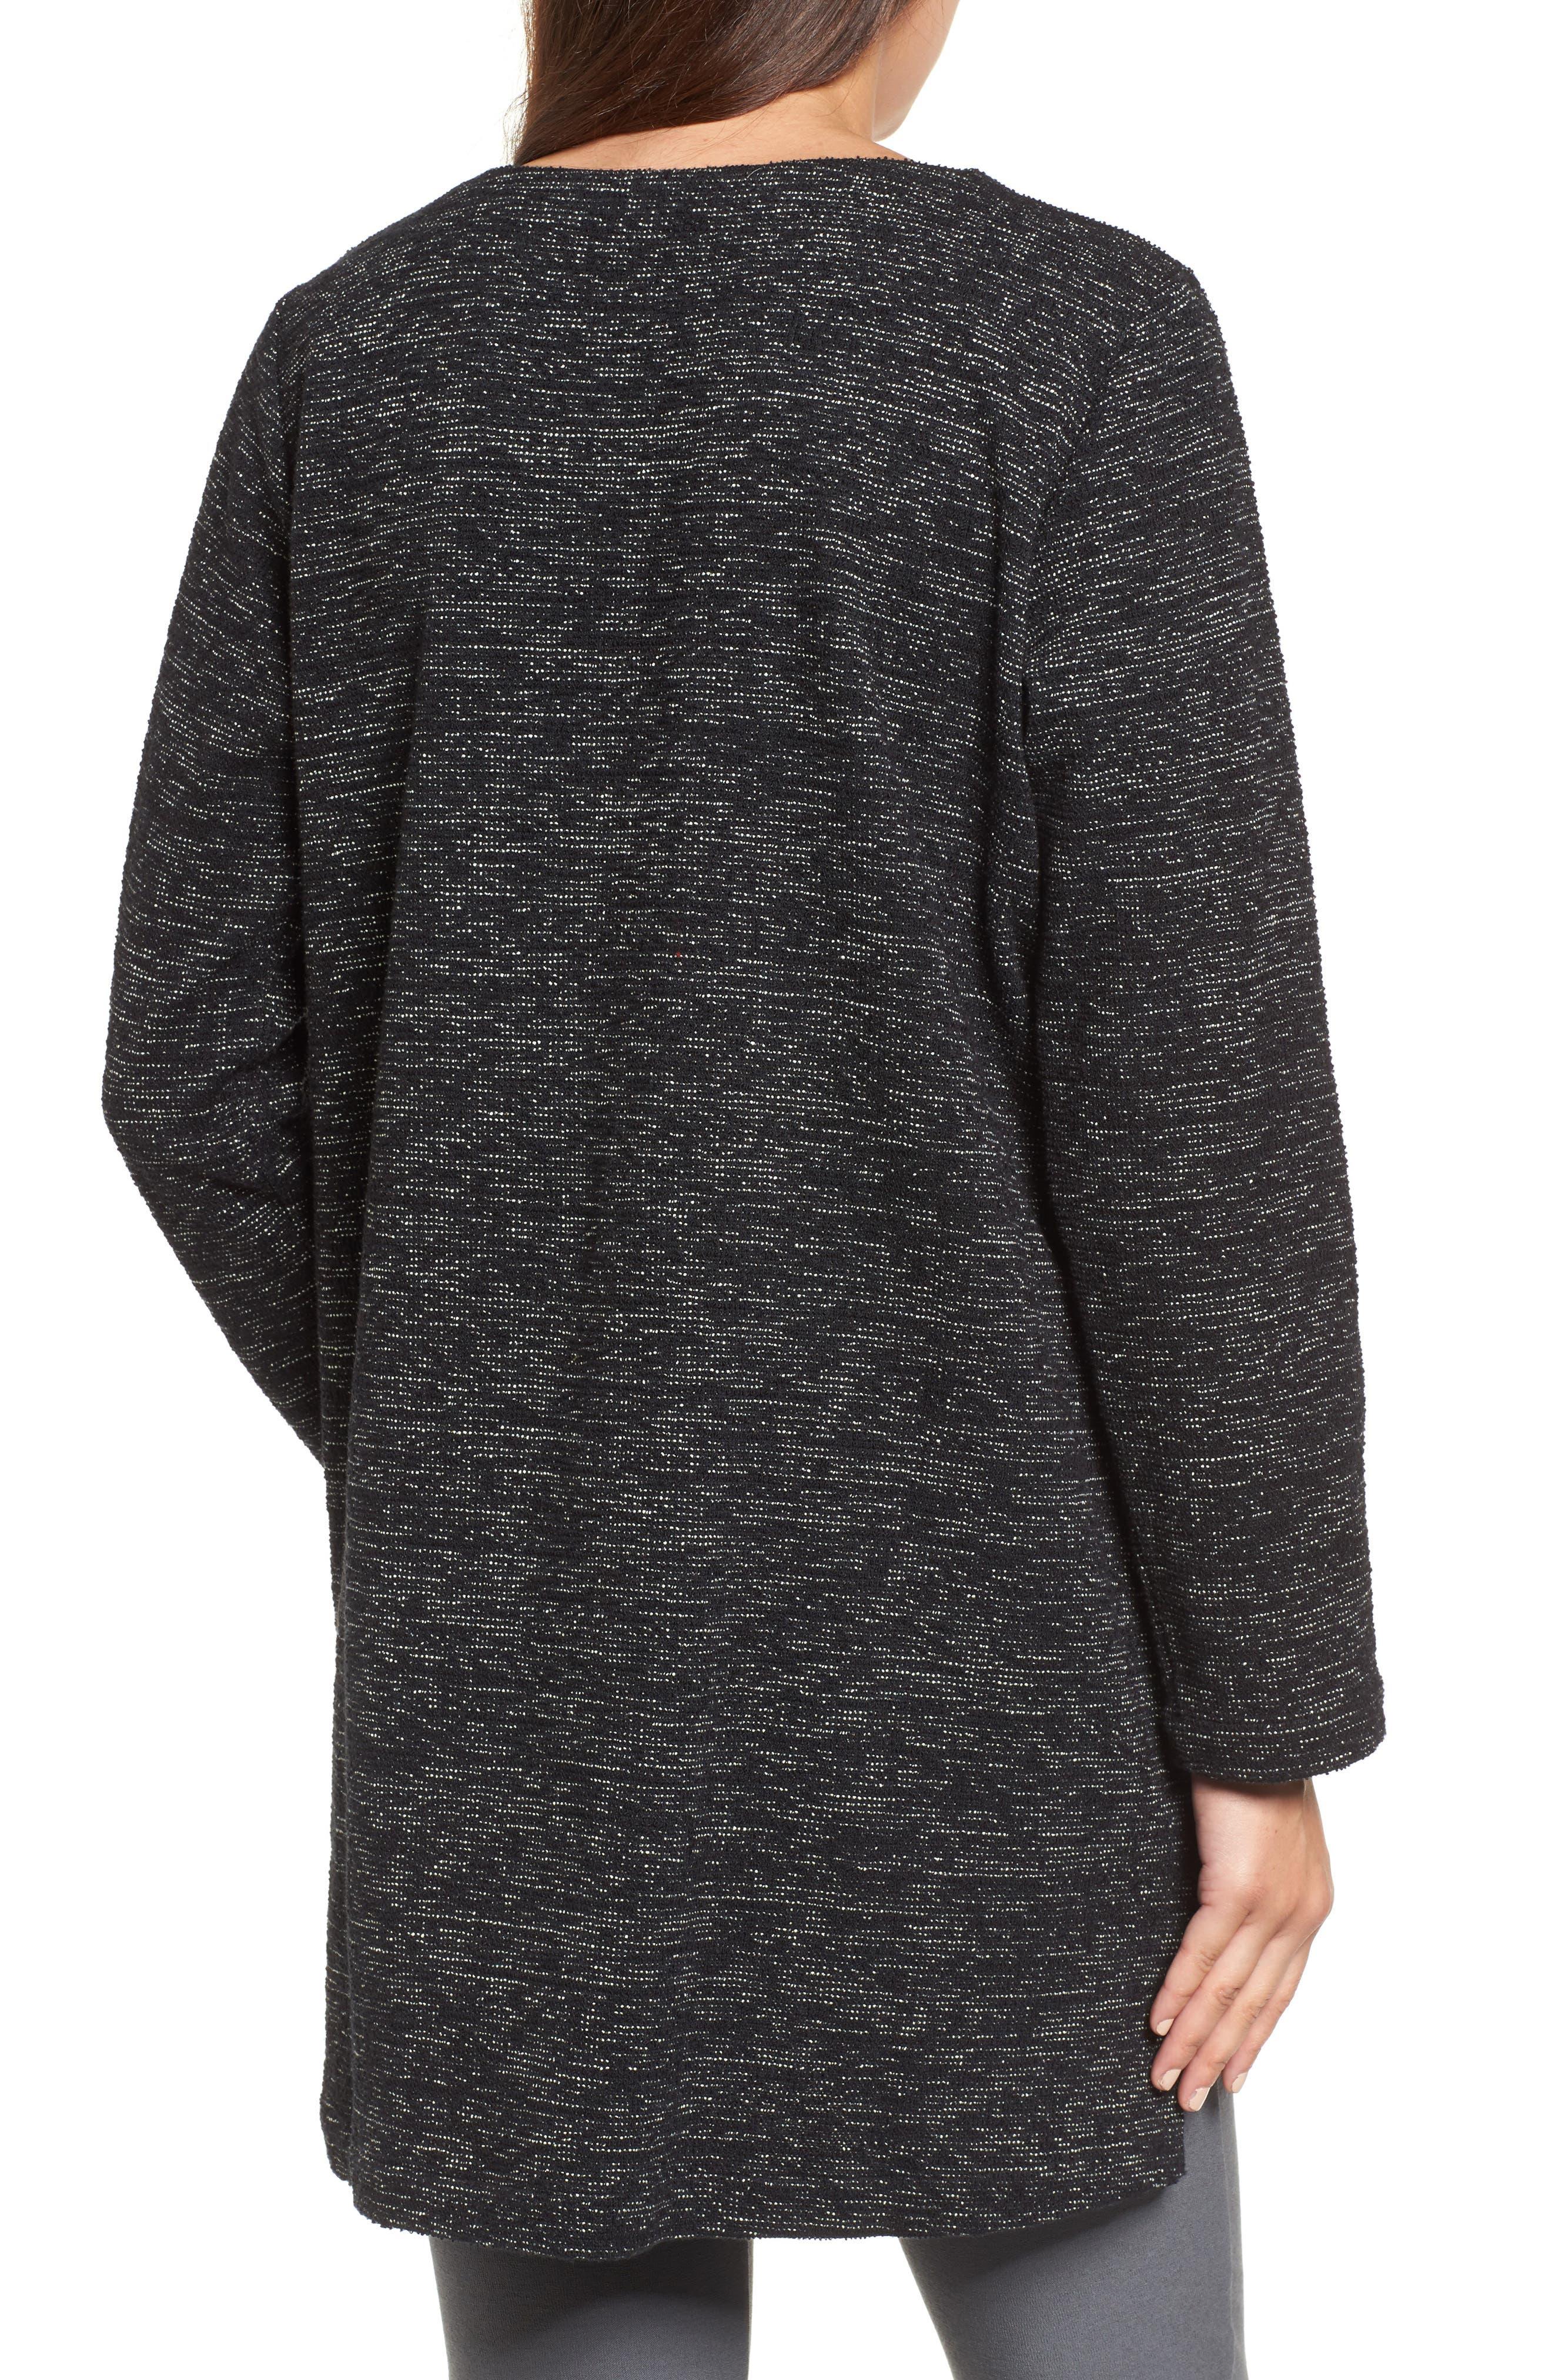 Boxy Organic Cotton Blend Tunic Sweater,                             Alternate thumbnail 2, color,                             Black